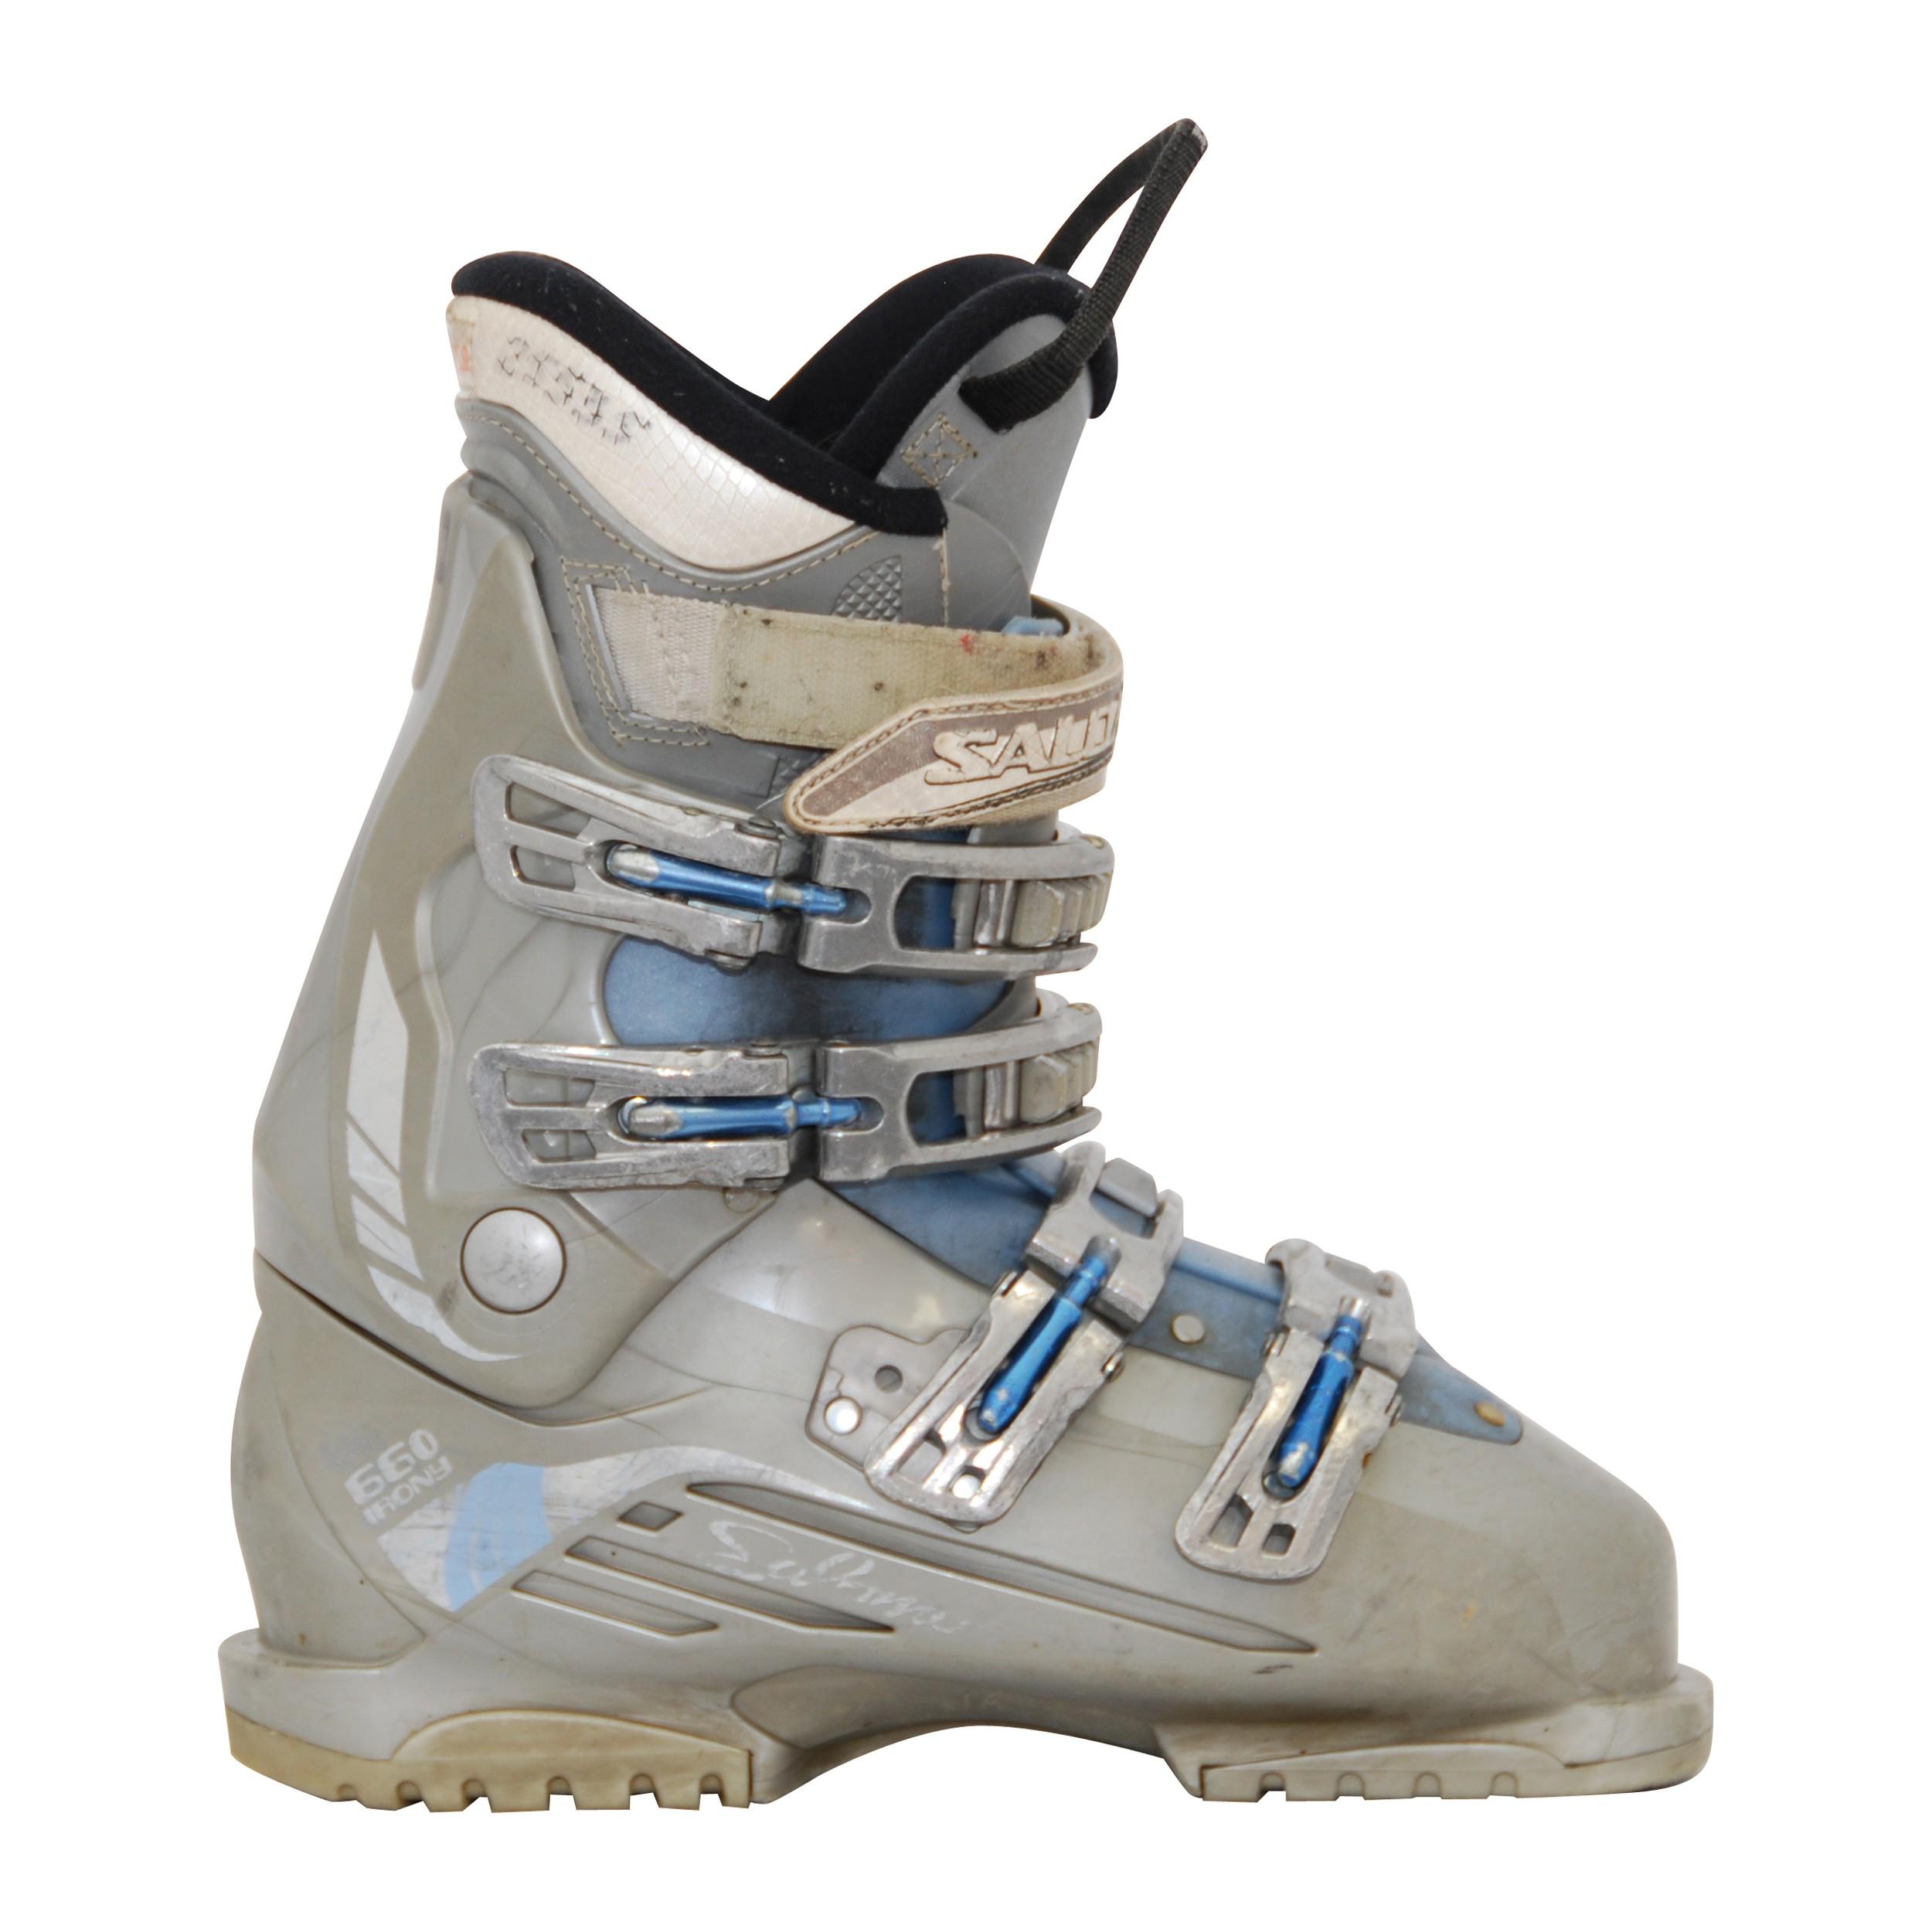 Chaussure de ski occasion Salomon performairony gris bleu